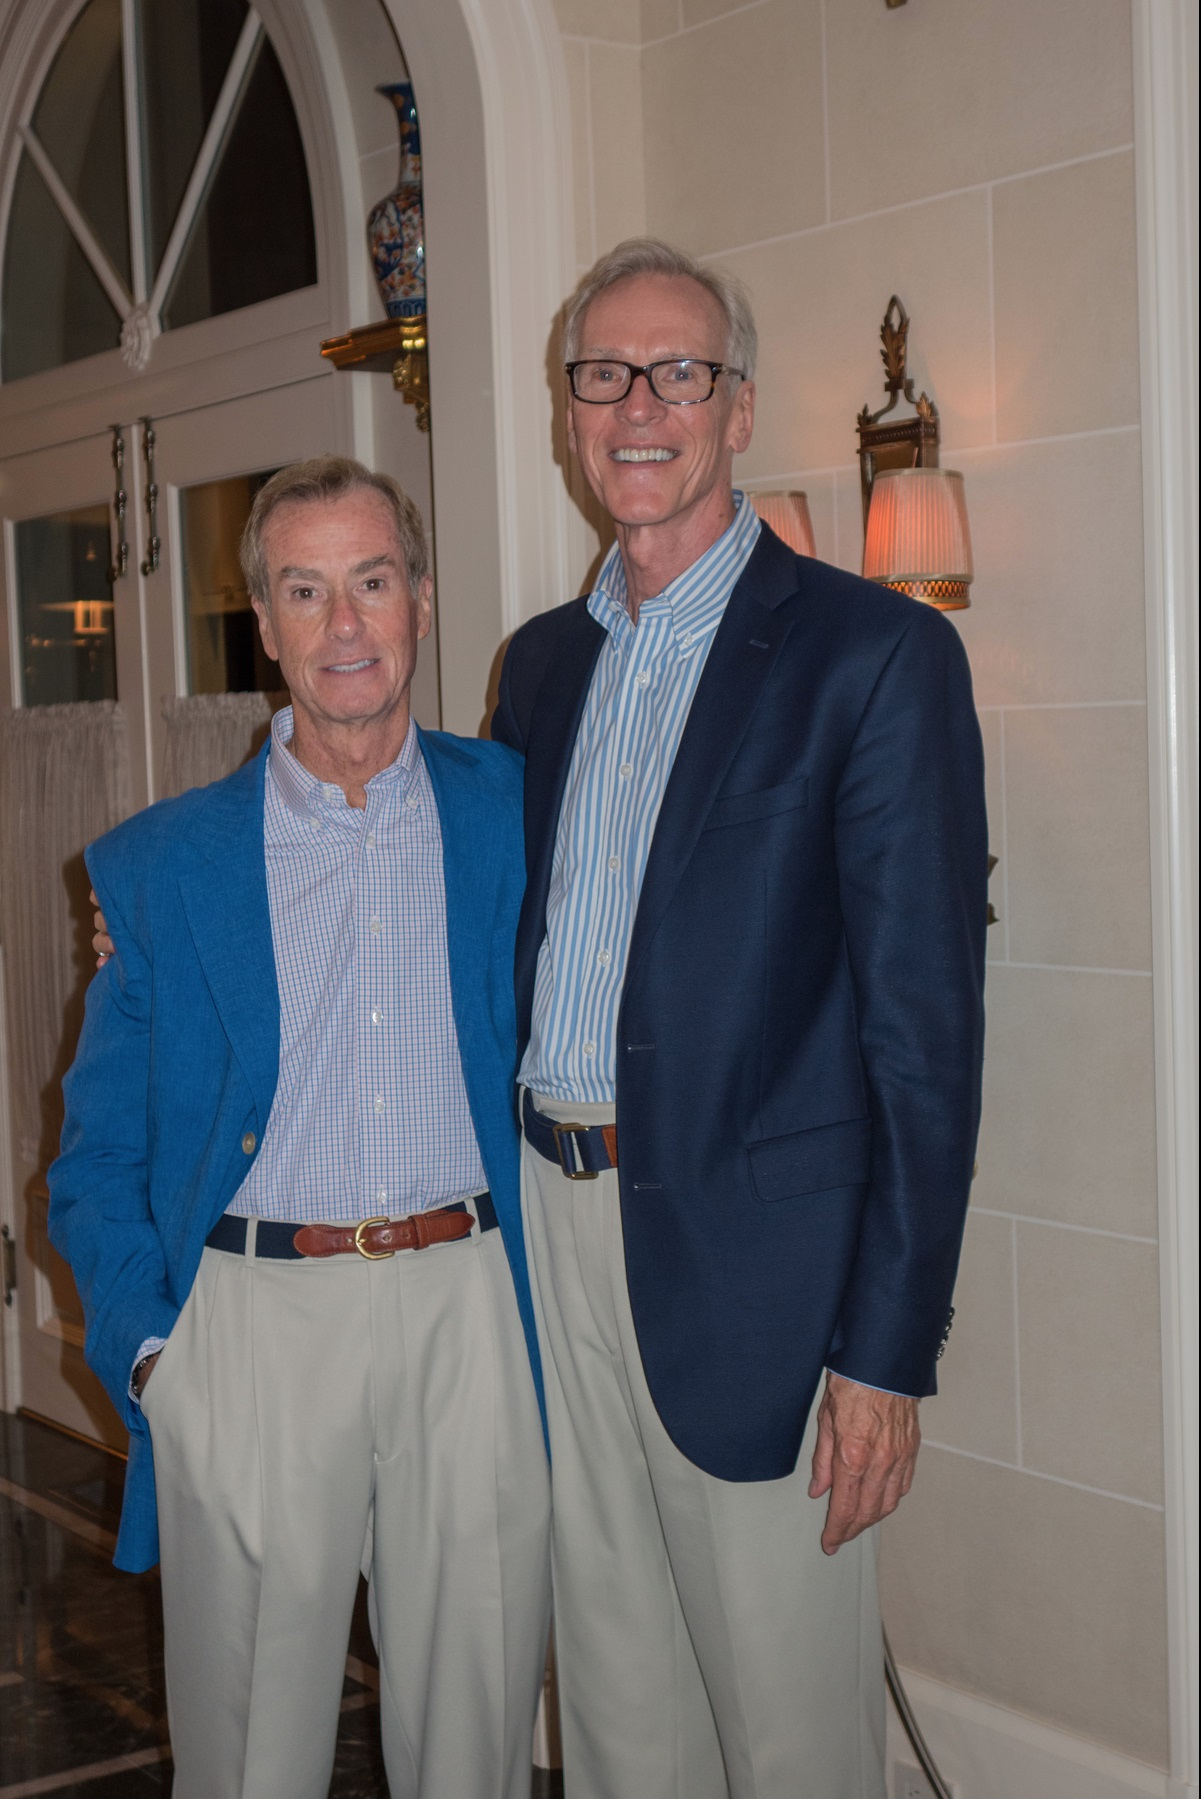 Bill-Fortune-and-Joe-Blakley.jpg